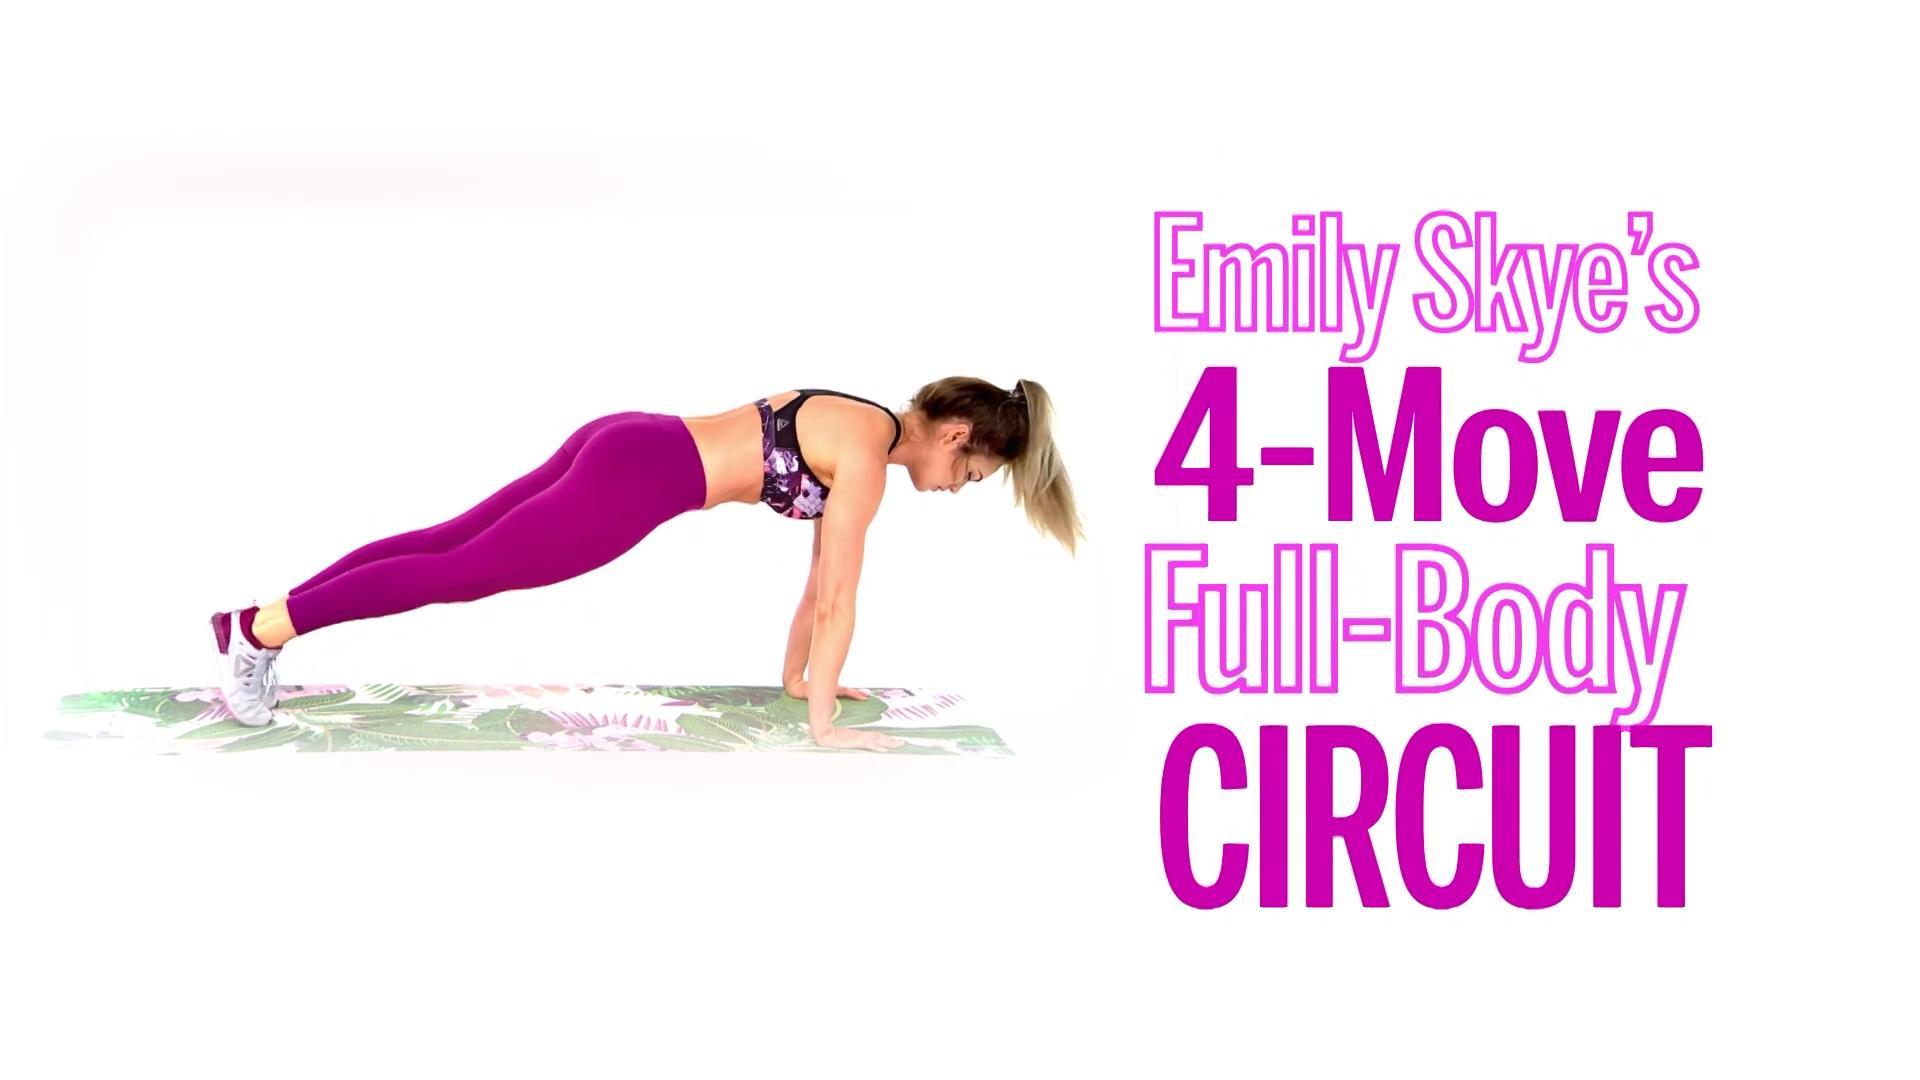 Emily Skye's 4-Move Full-Body Circuit